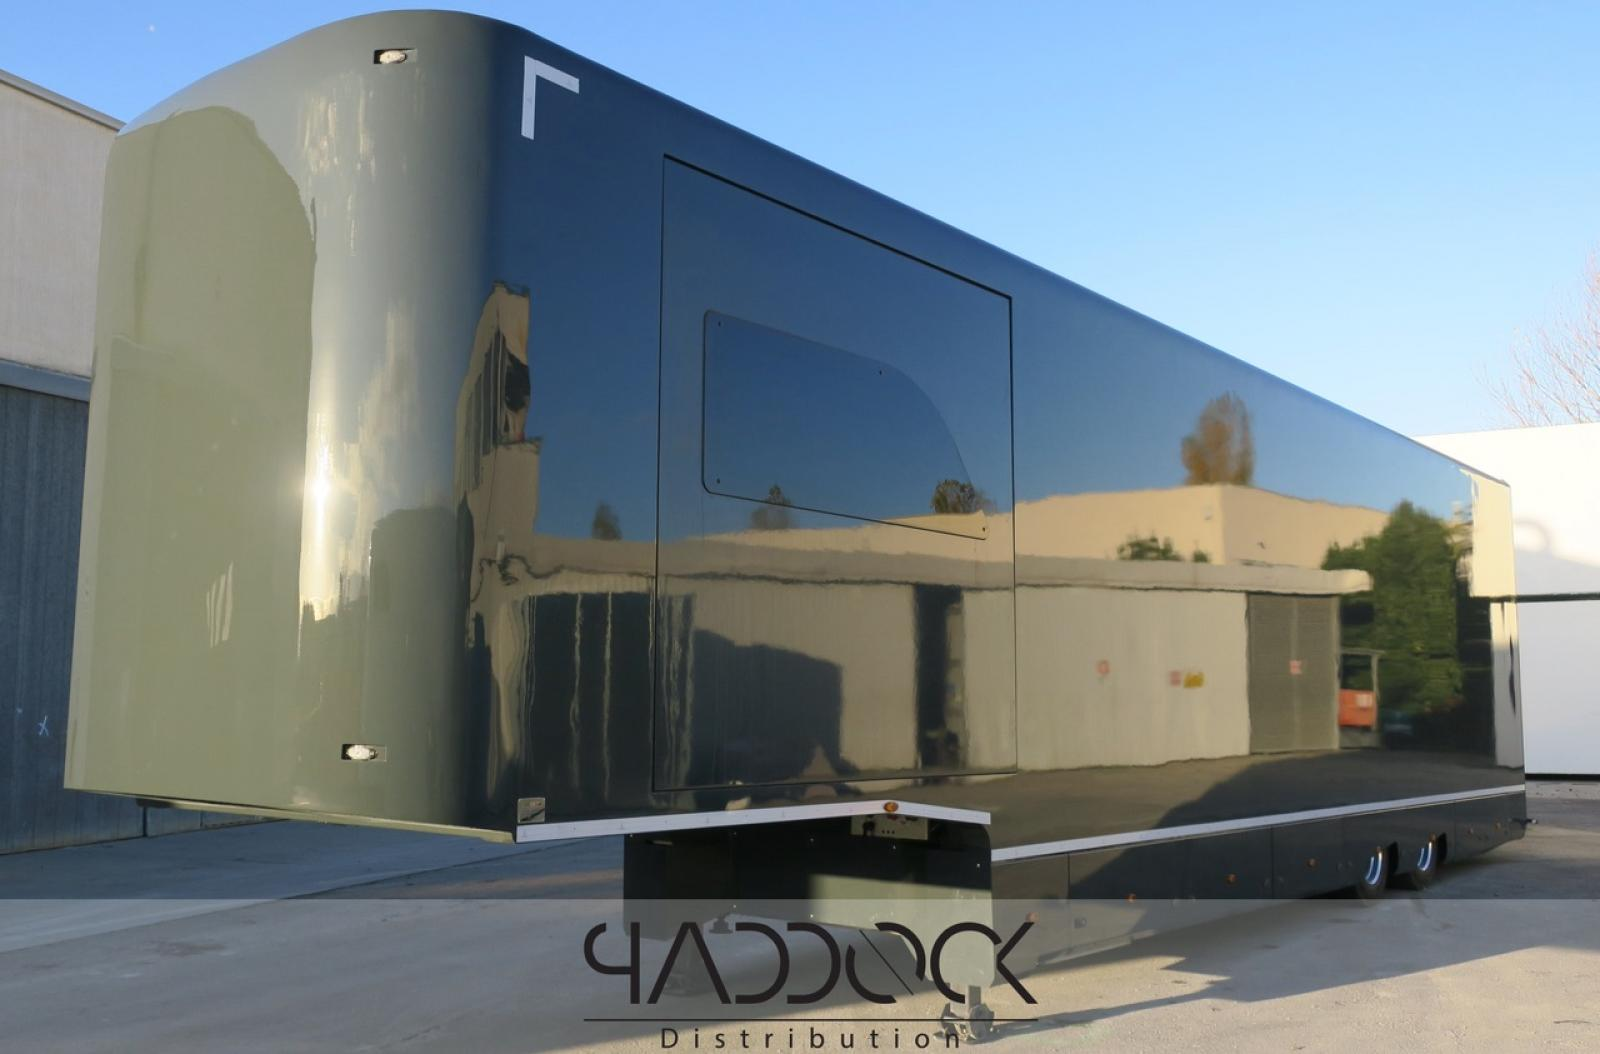 NEW 2020 ASTA CAR TRAILER BY PADDOCK DISTRIBUTION - 1